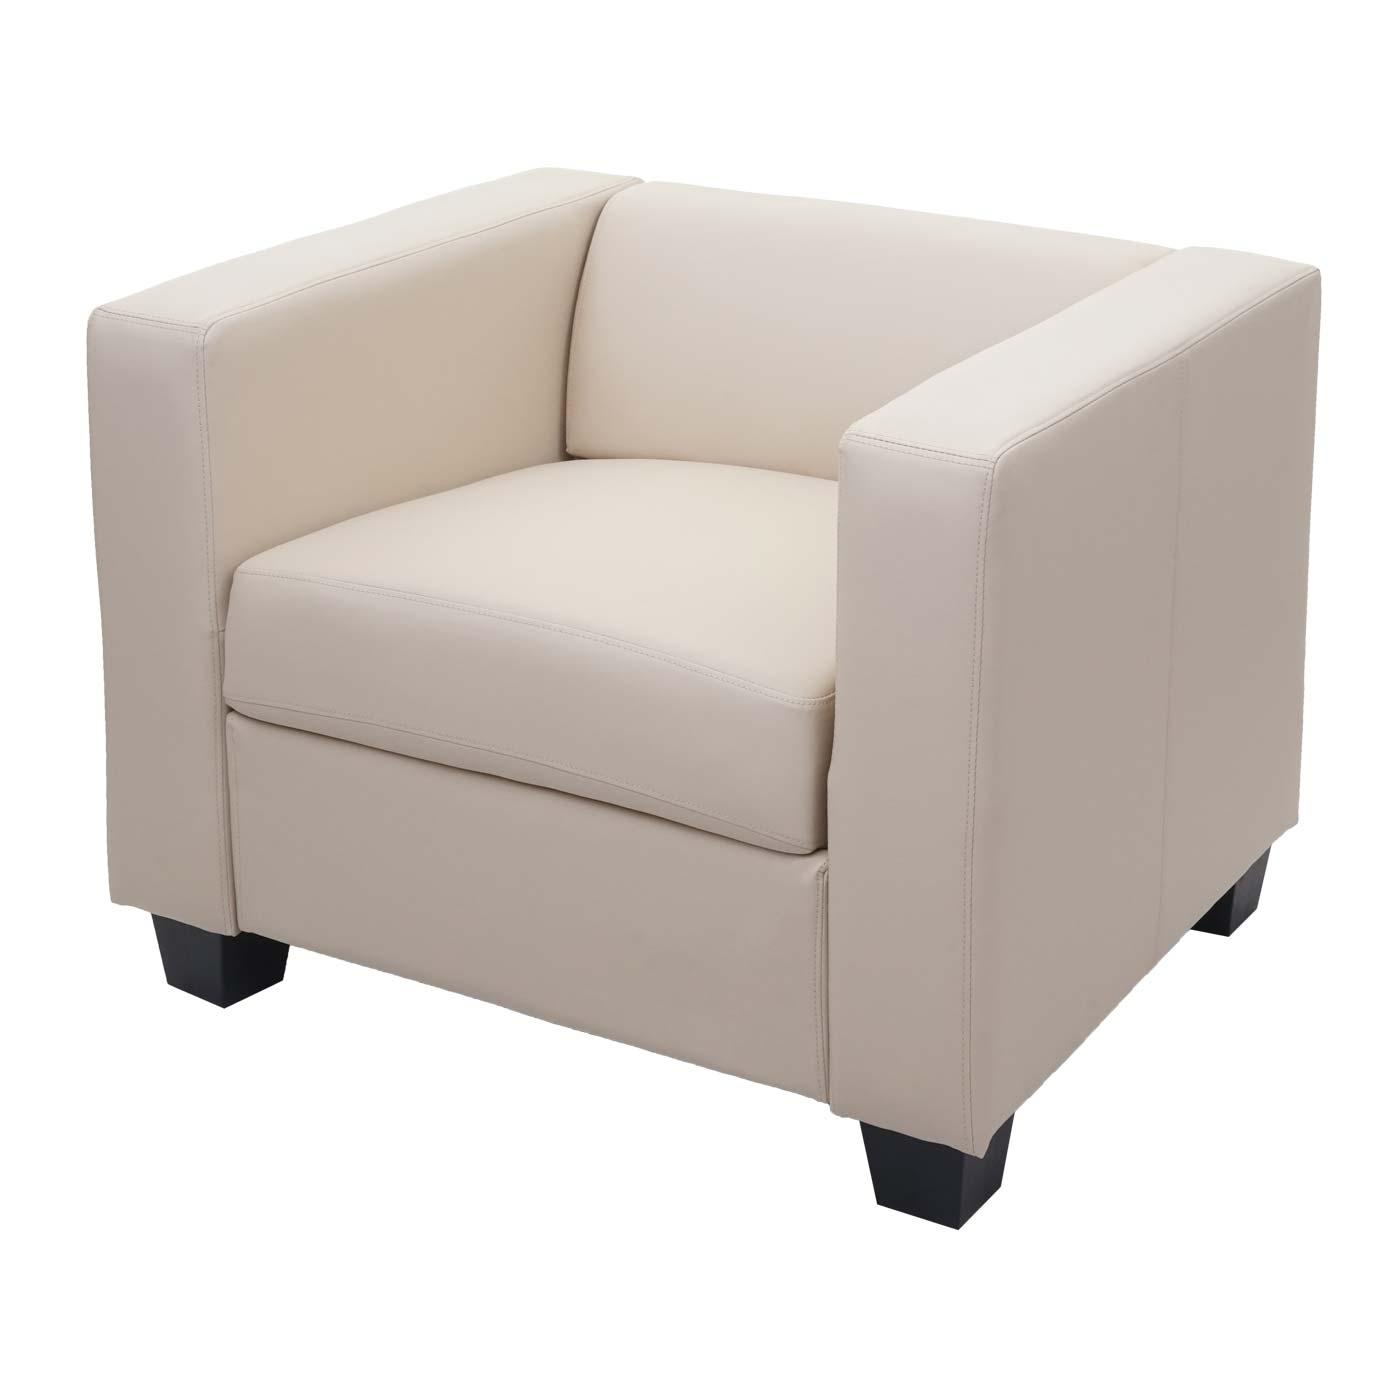 Sessel Loungesessel Lille Seitenansicht